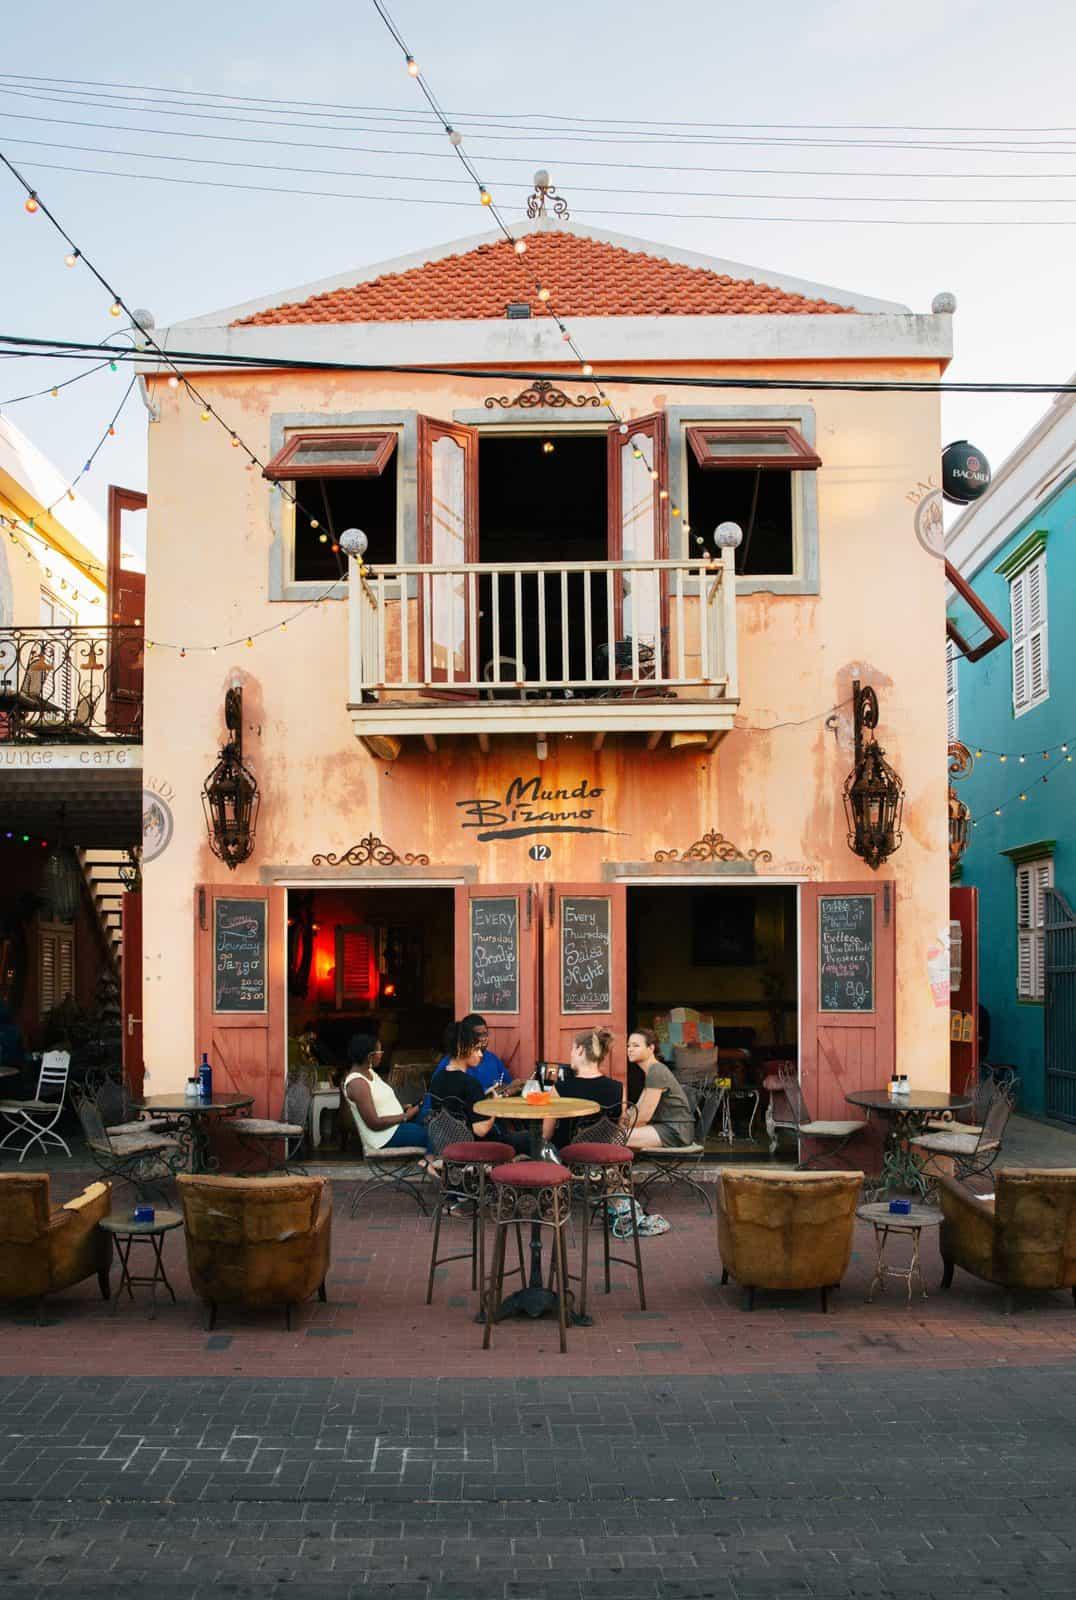 A colorful restaurant in Willemstad's Pietermaai District